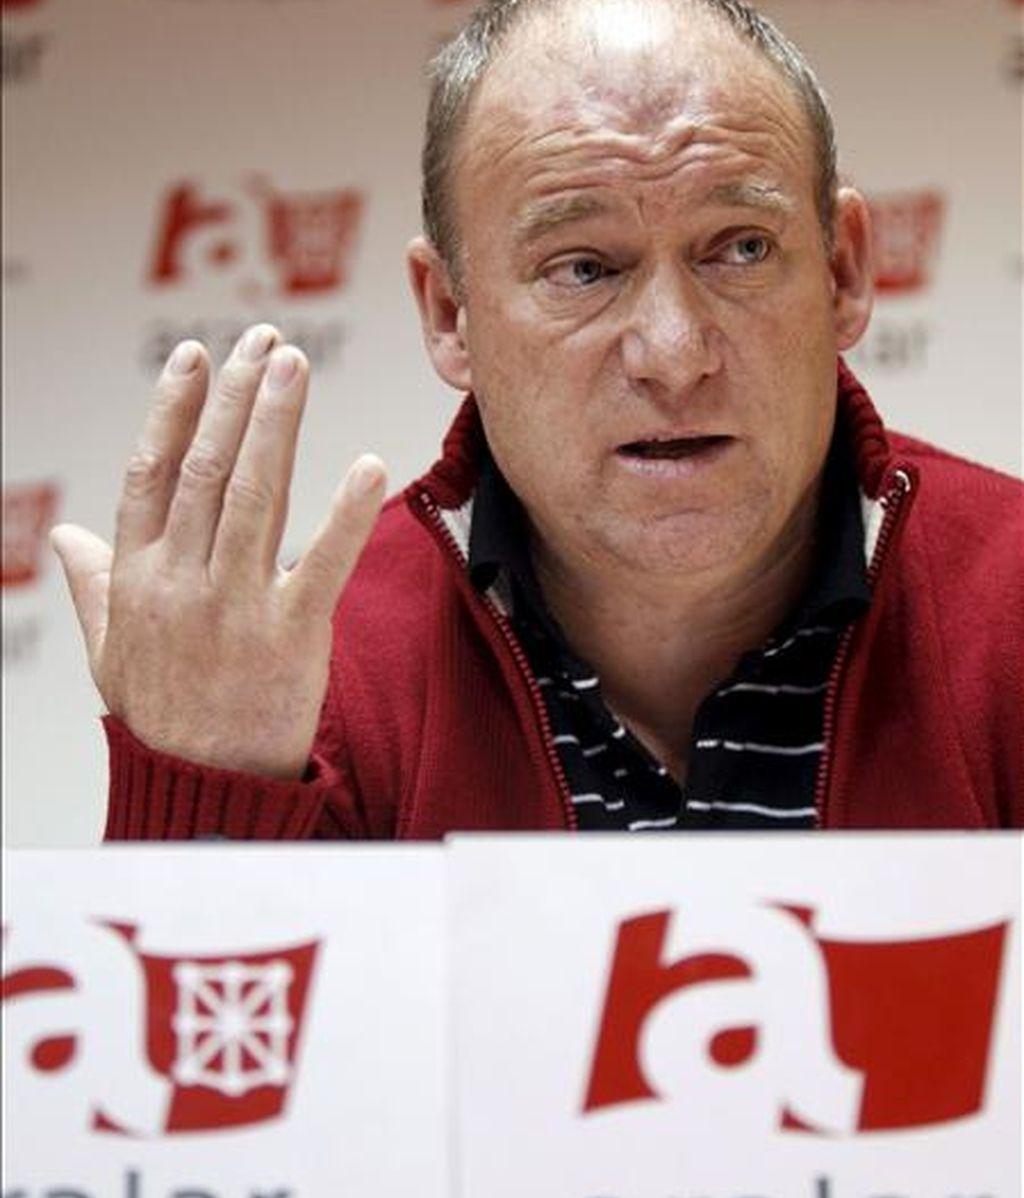 El coordinador de Aralar, Txentxo Jiménez. EFE/Archivo